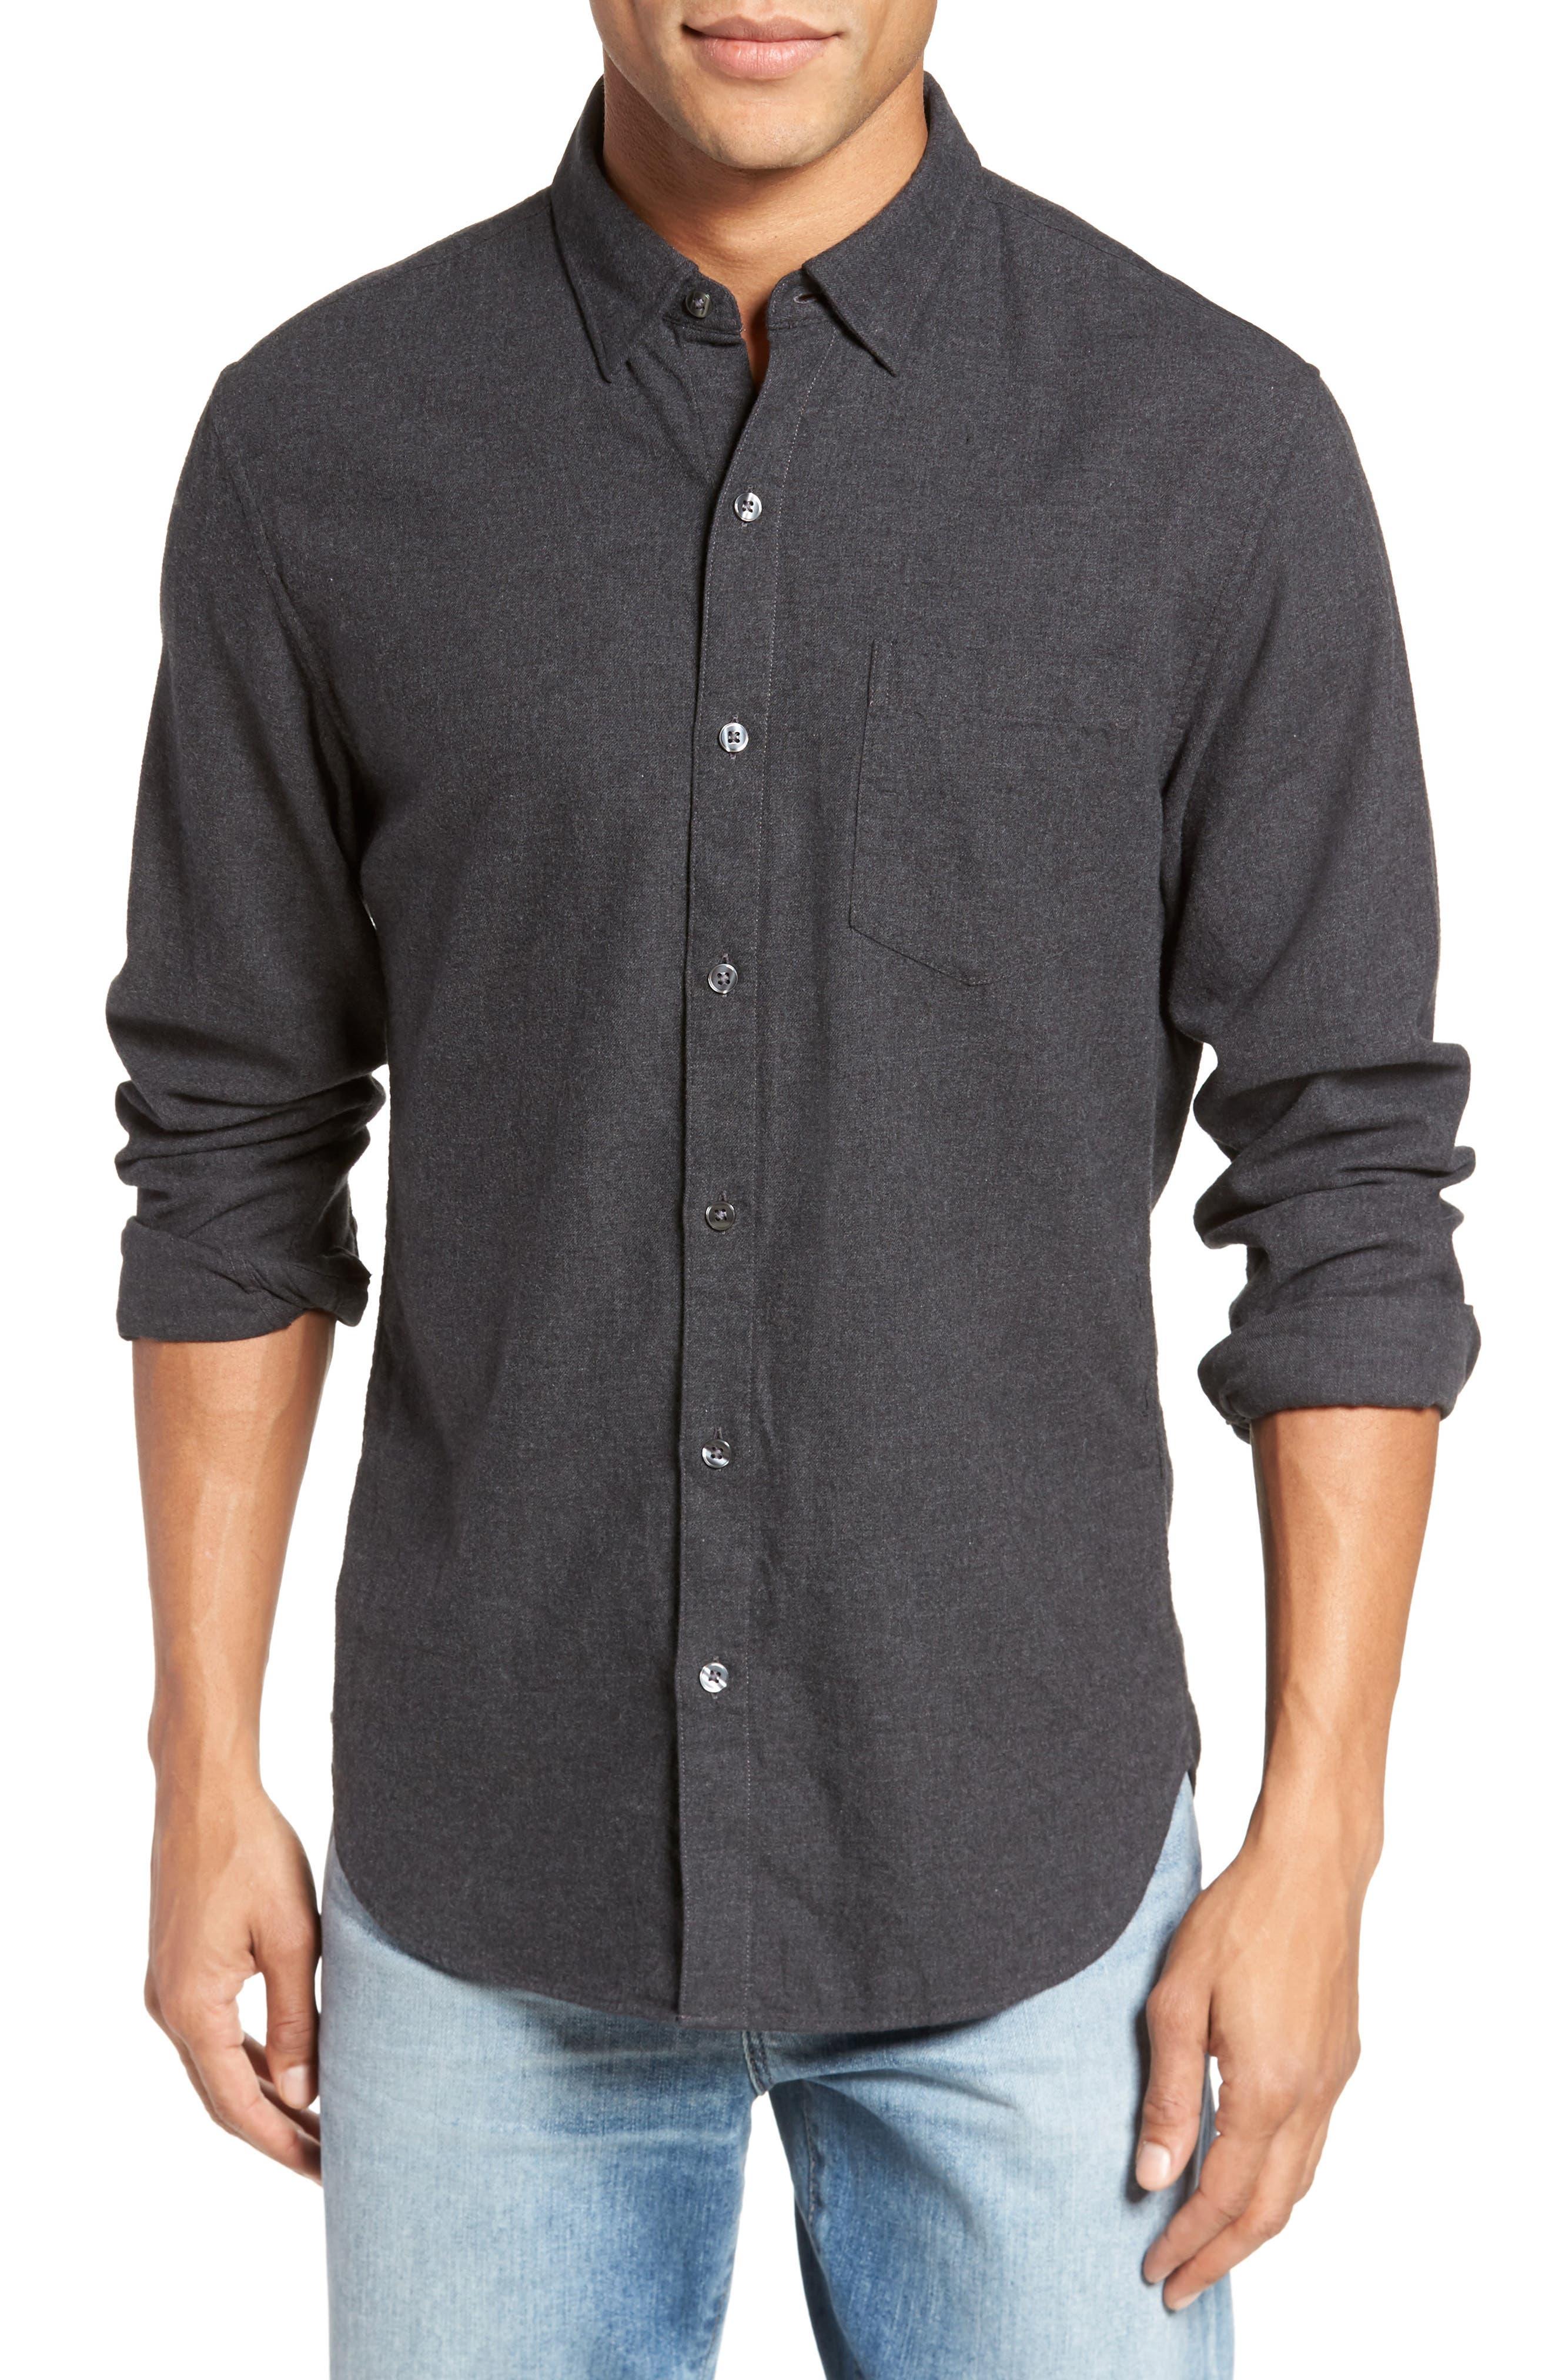 Alternate Image 1 Selected - Bonobos Slim Fit Brushed Twill Sport Shirt